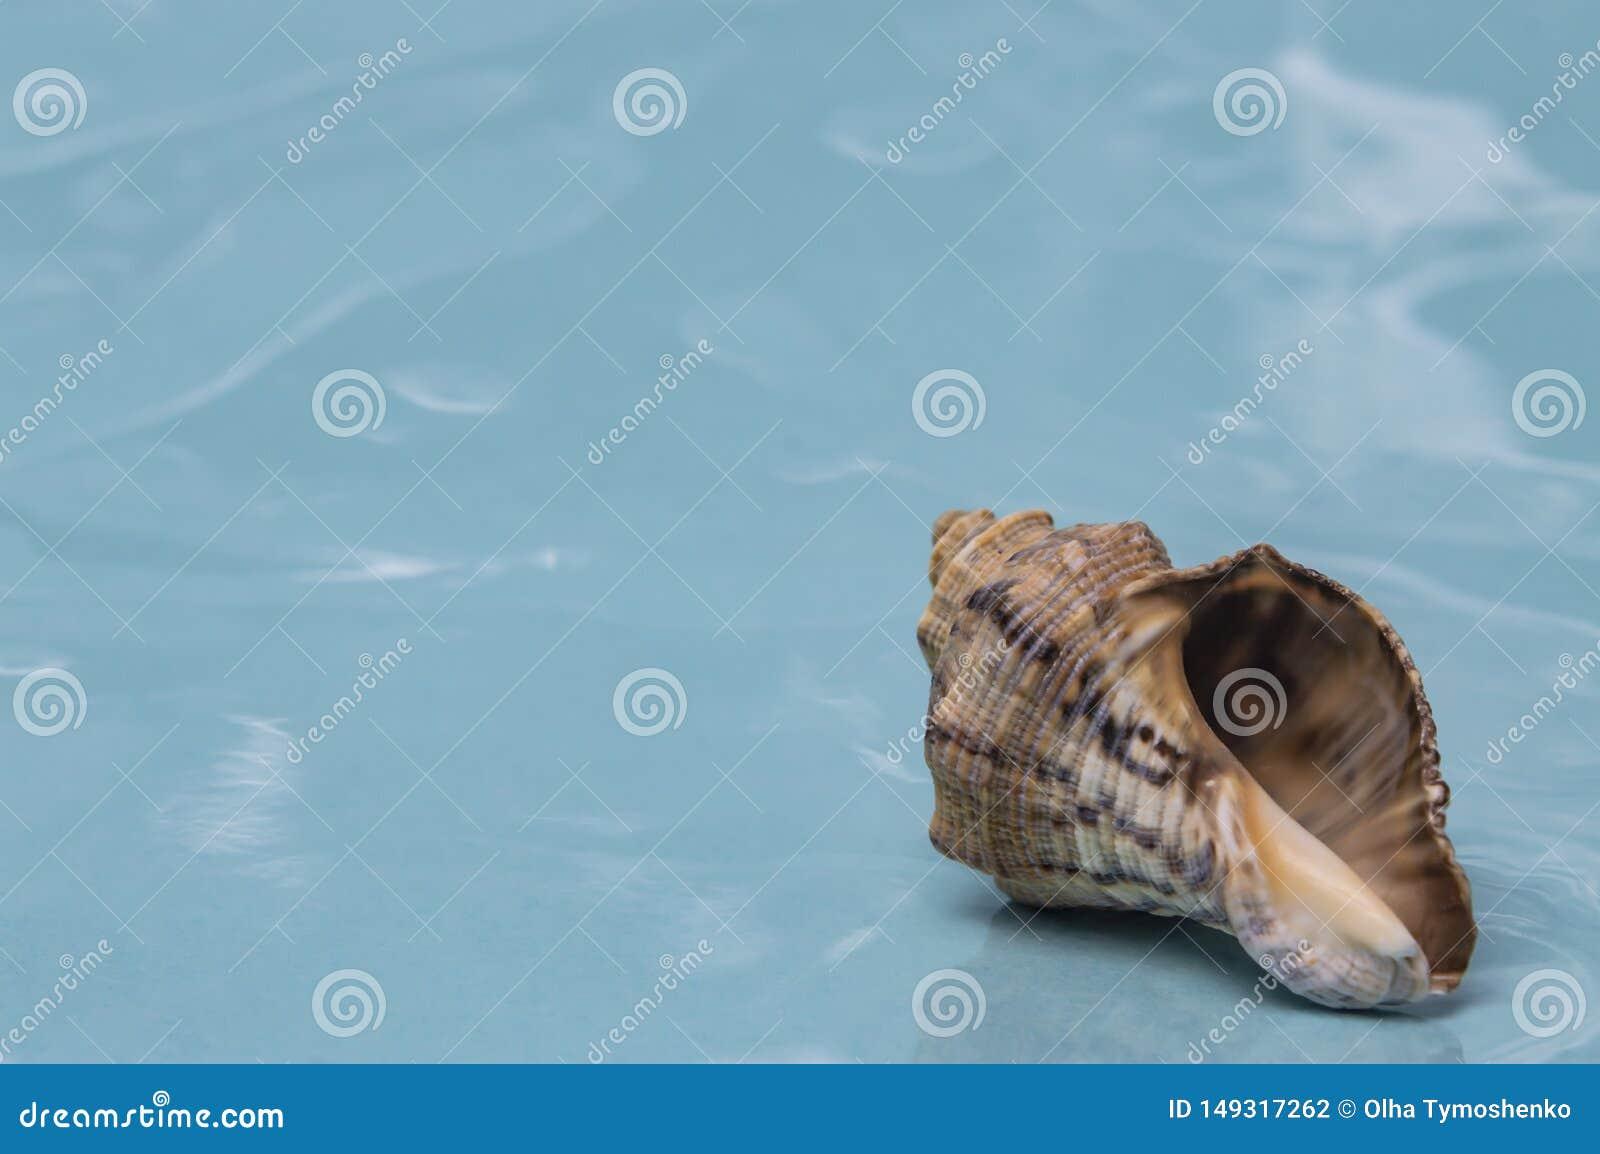 Overzeese shells reis aan overzeese droom en rust dichte omhooggaand